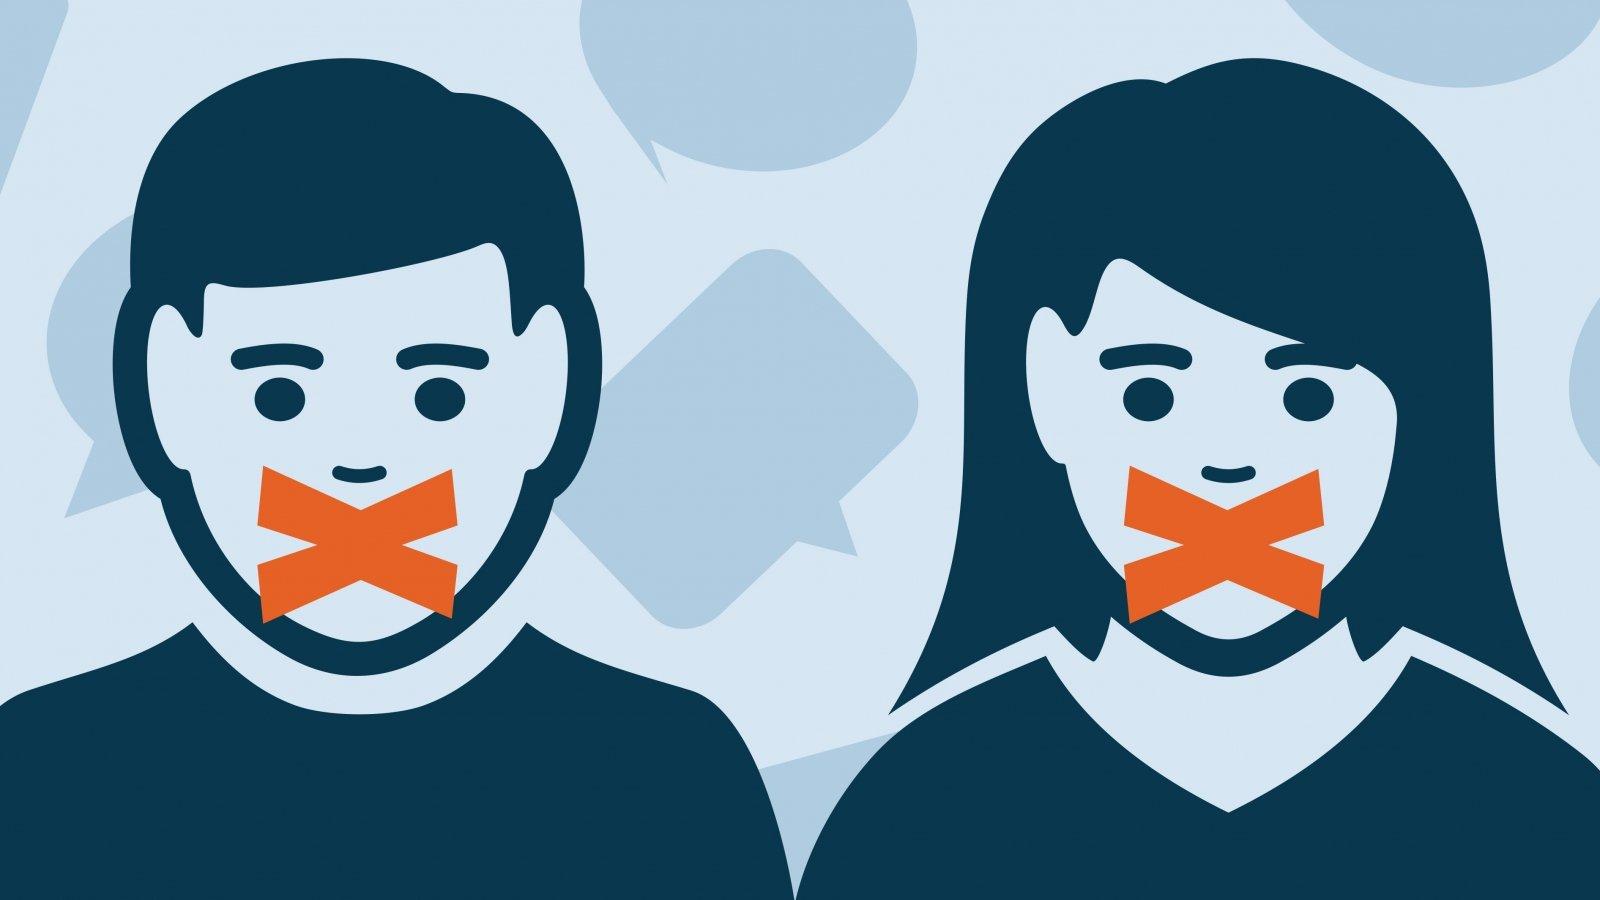 Vice Runs INSANE Piece Bashing Defenders Of Free Speech